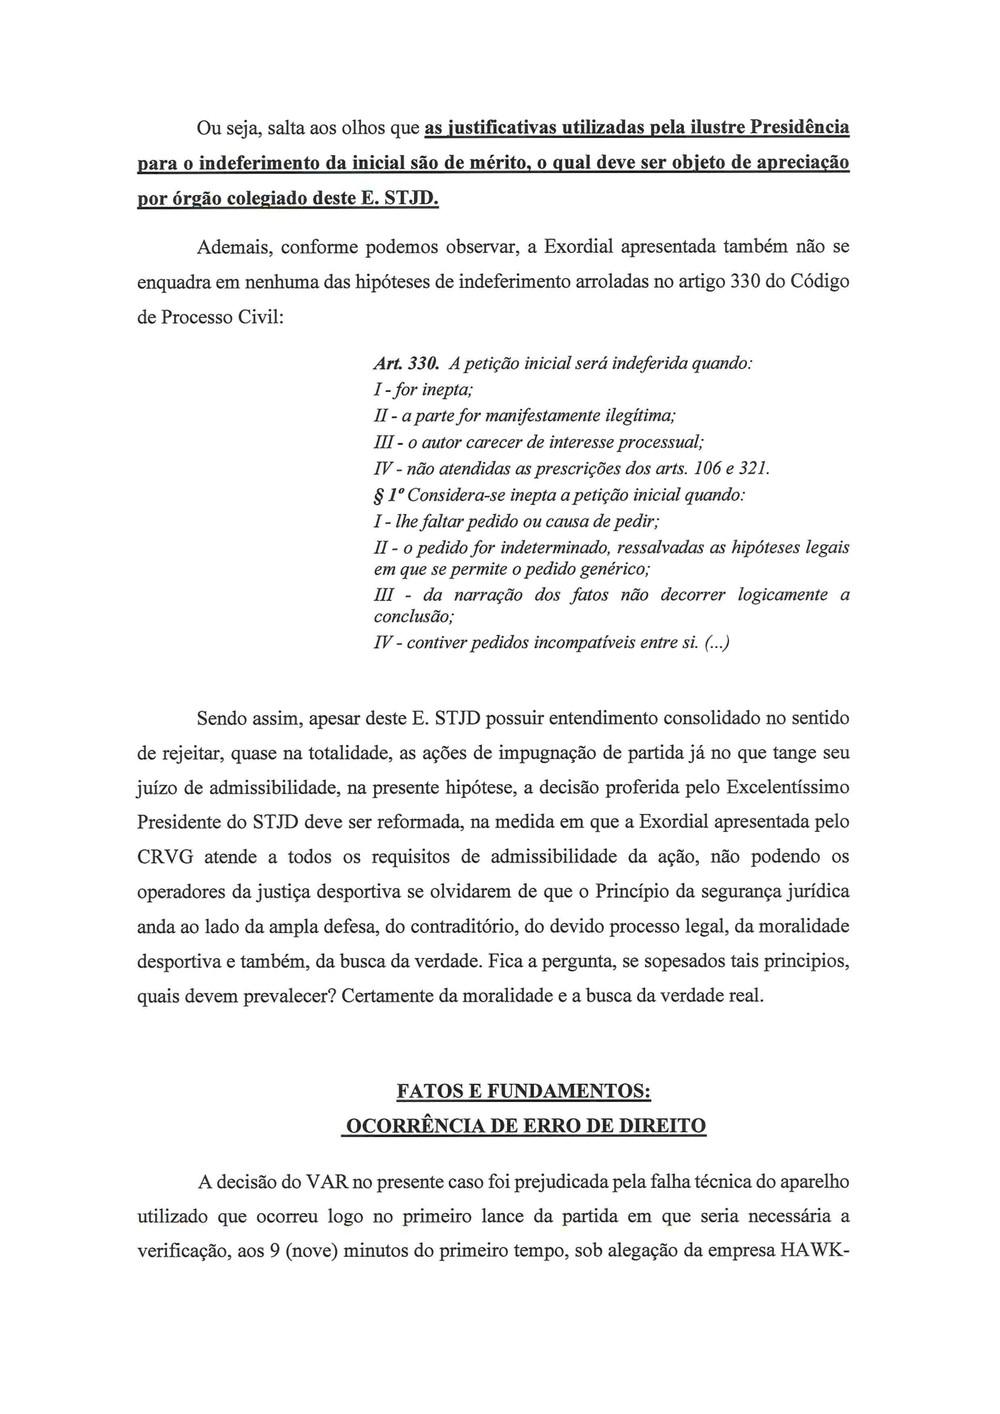 stjd-medida-inominada-vasco-x-inter-07